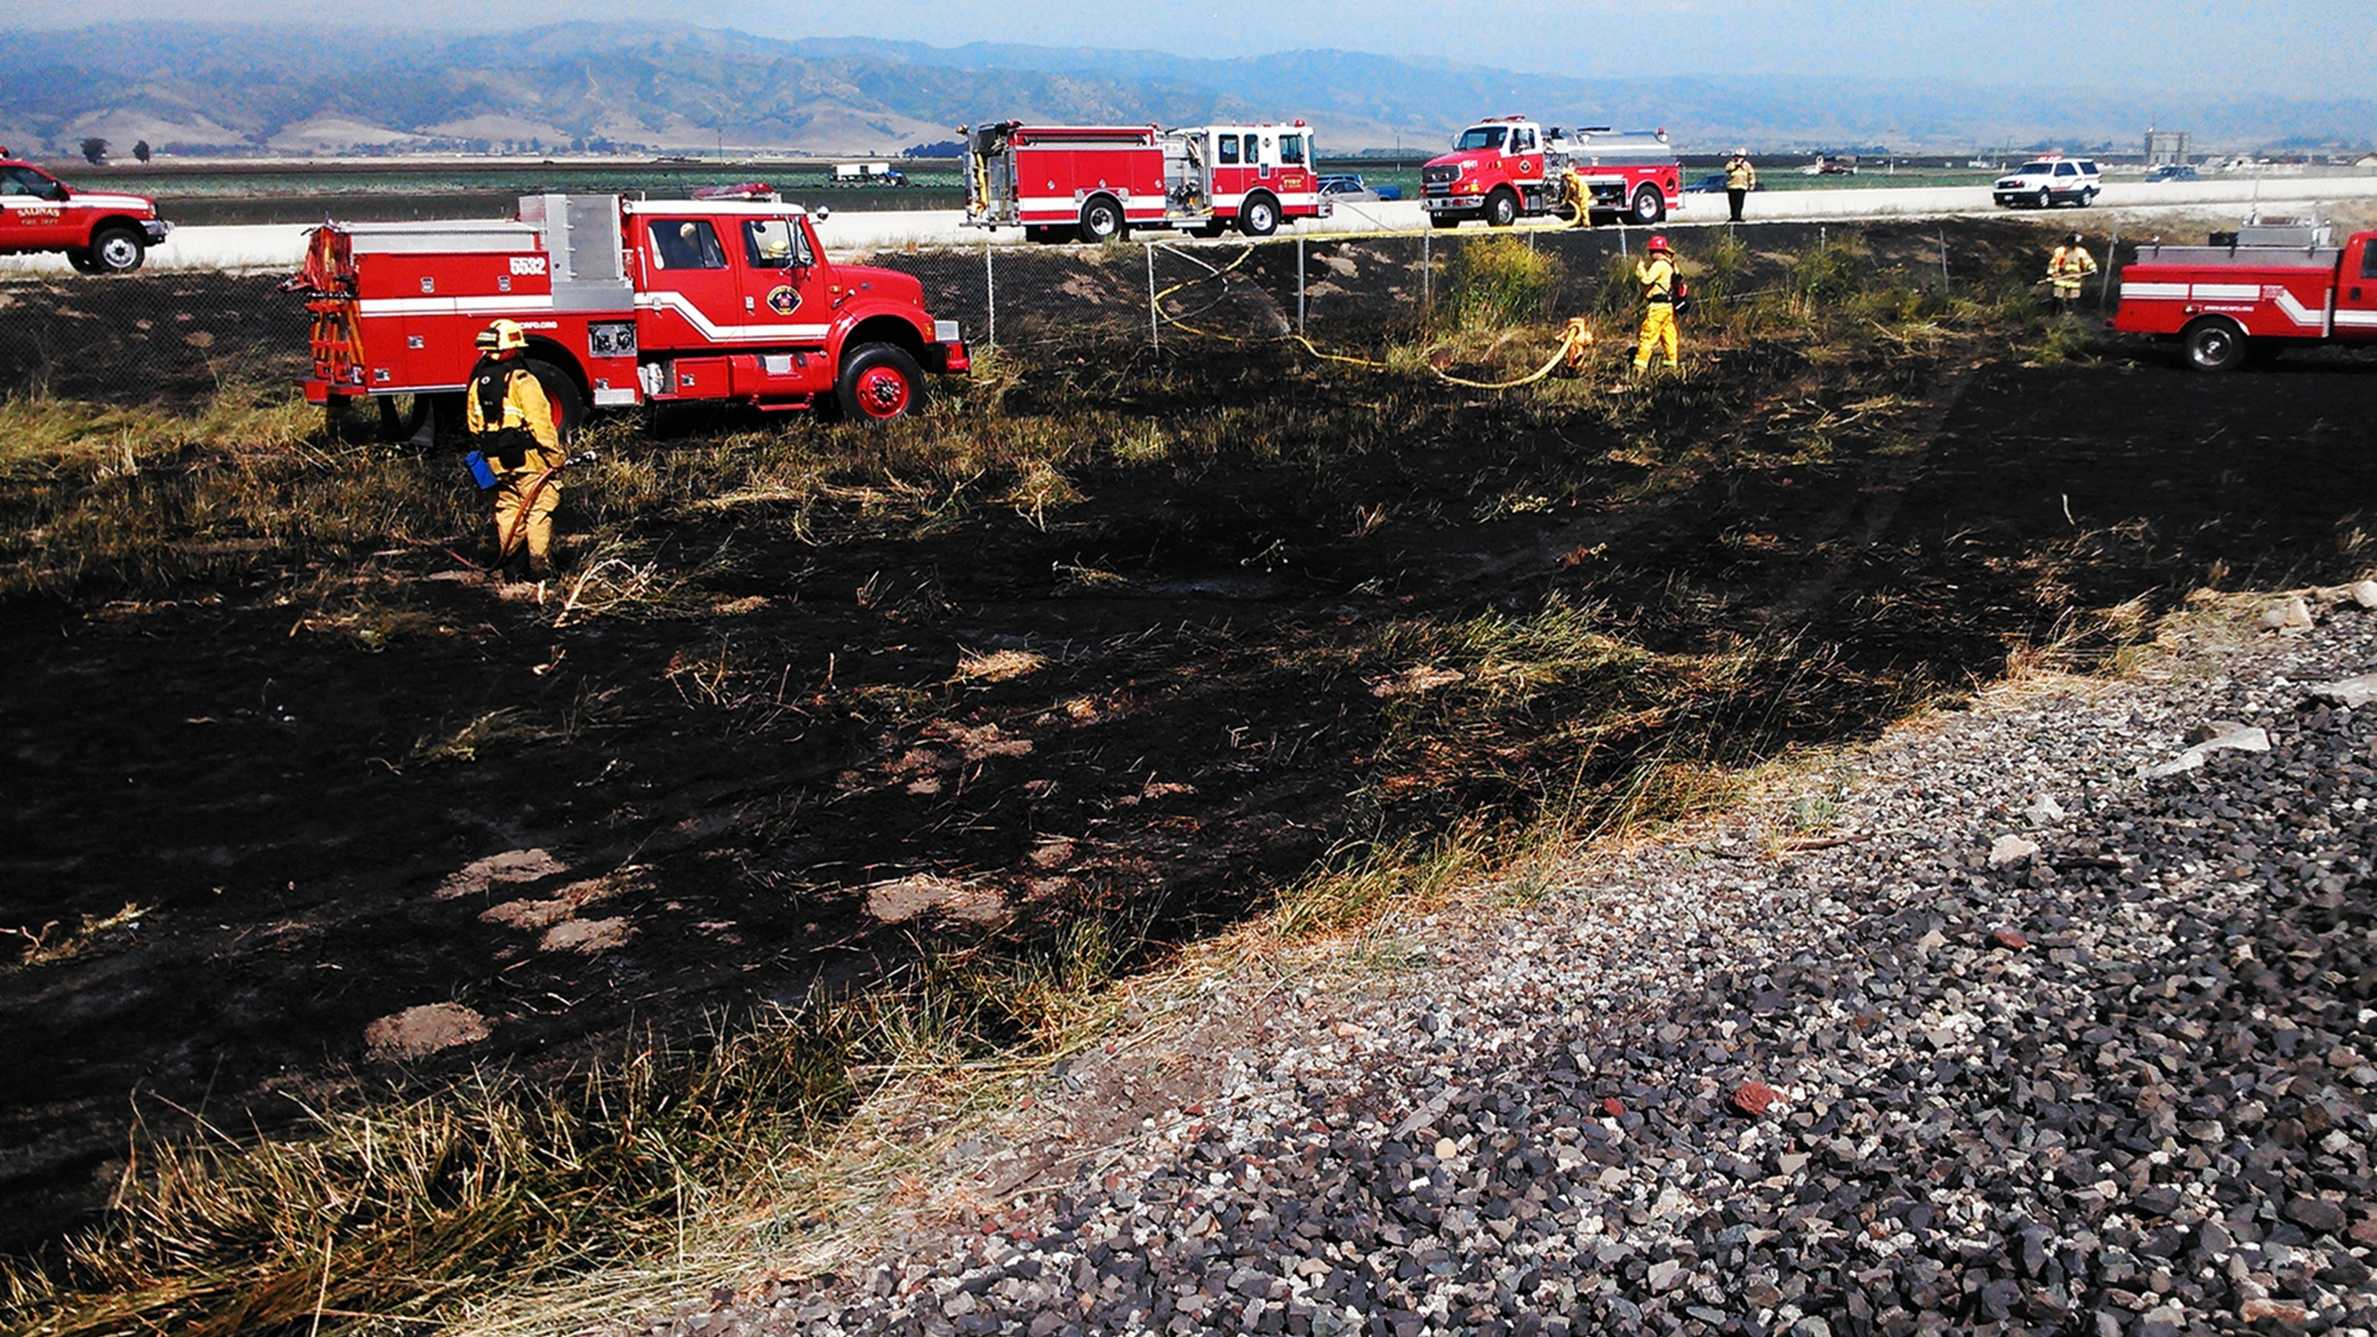 Salinas fire (April 22, 2015)